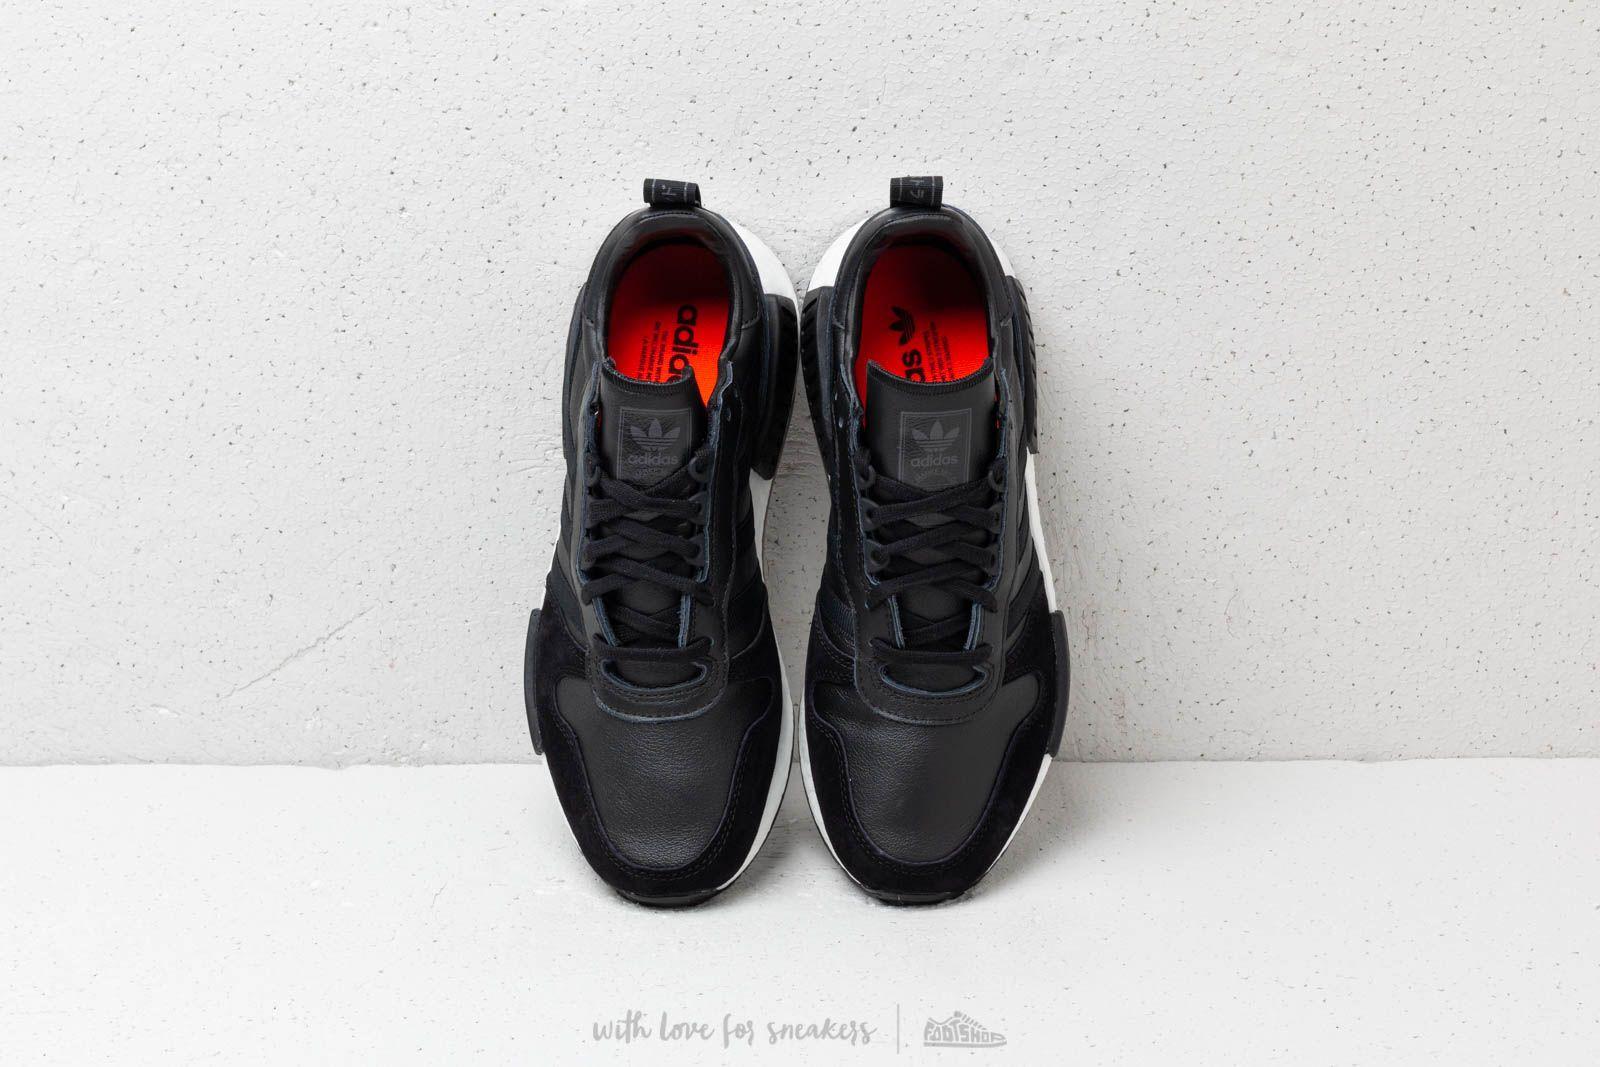 adidas Rising Star x R1 Core Black Utility Black Solar Red